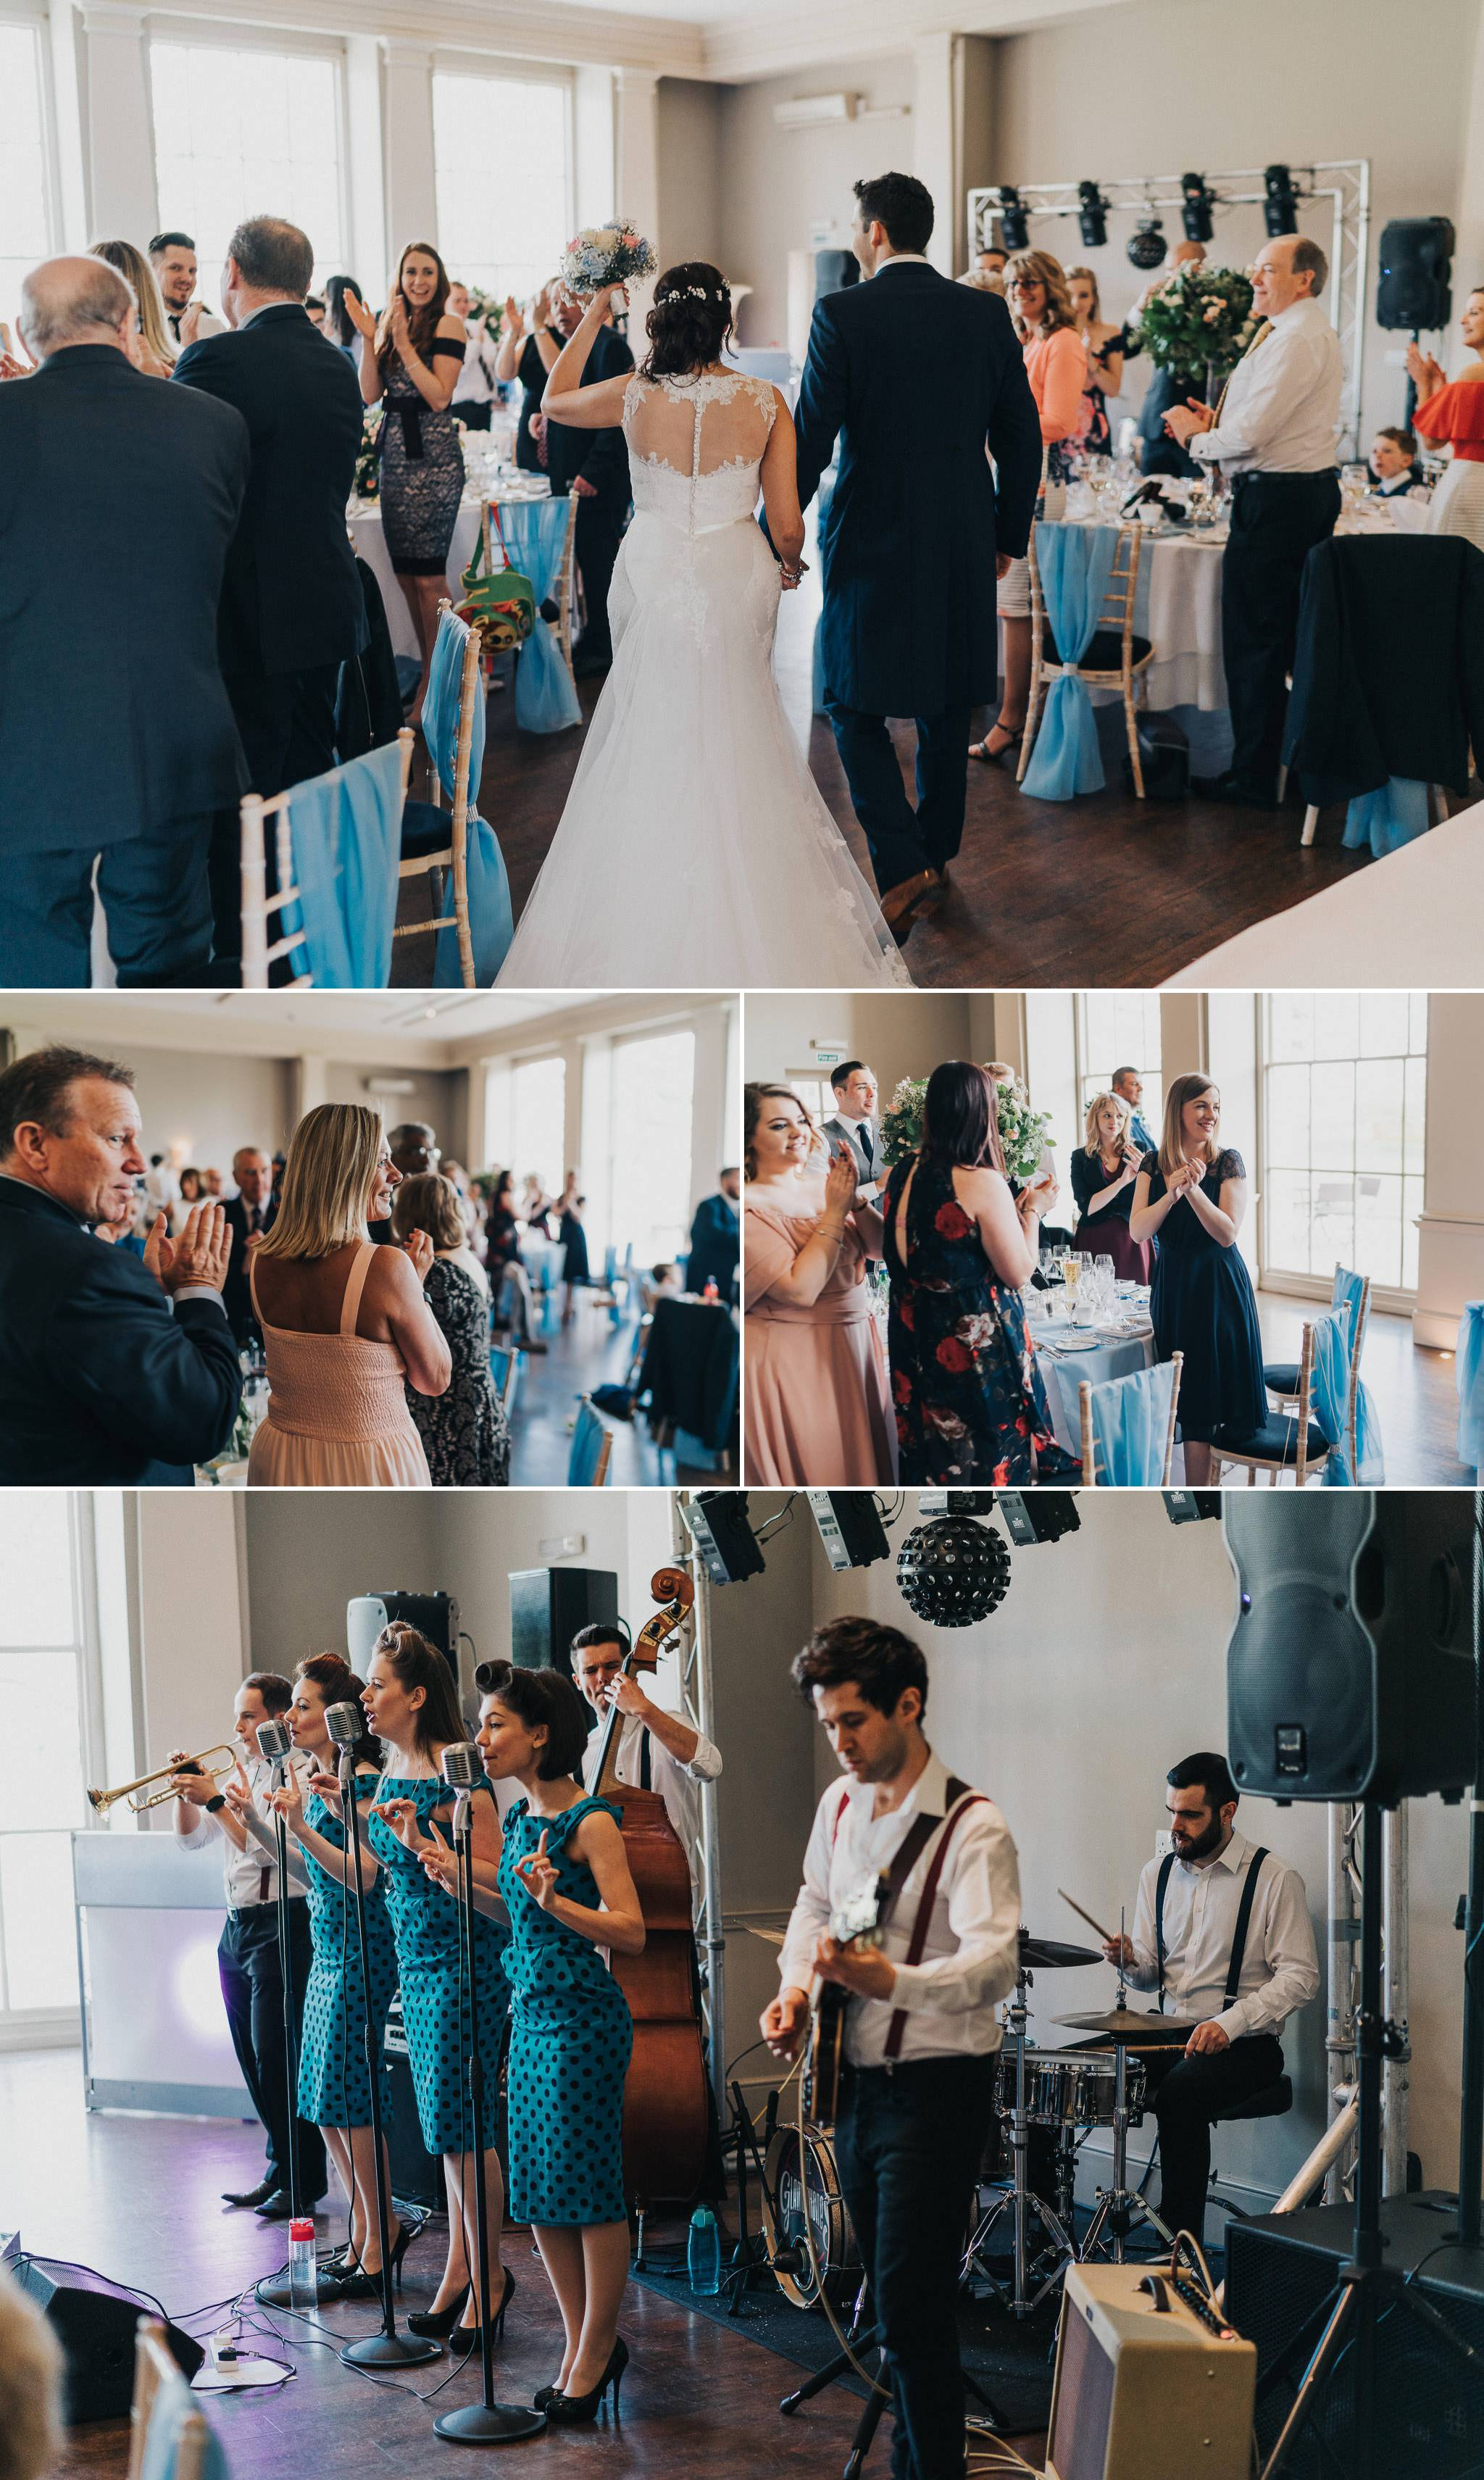 stubton-hall-wedding-photography 15.jpg